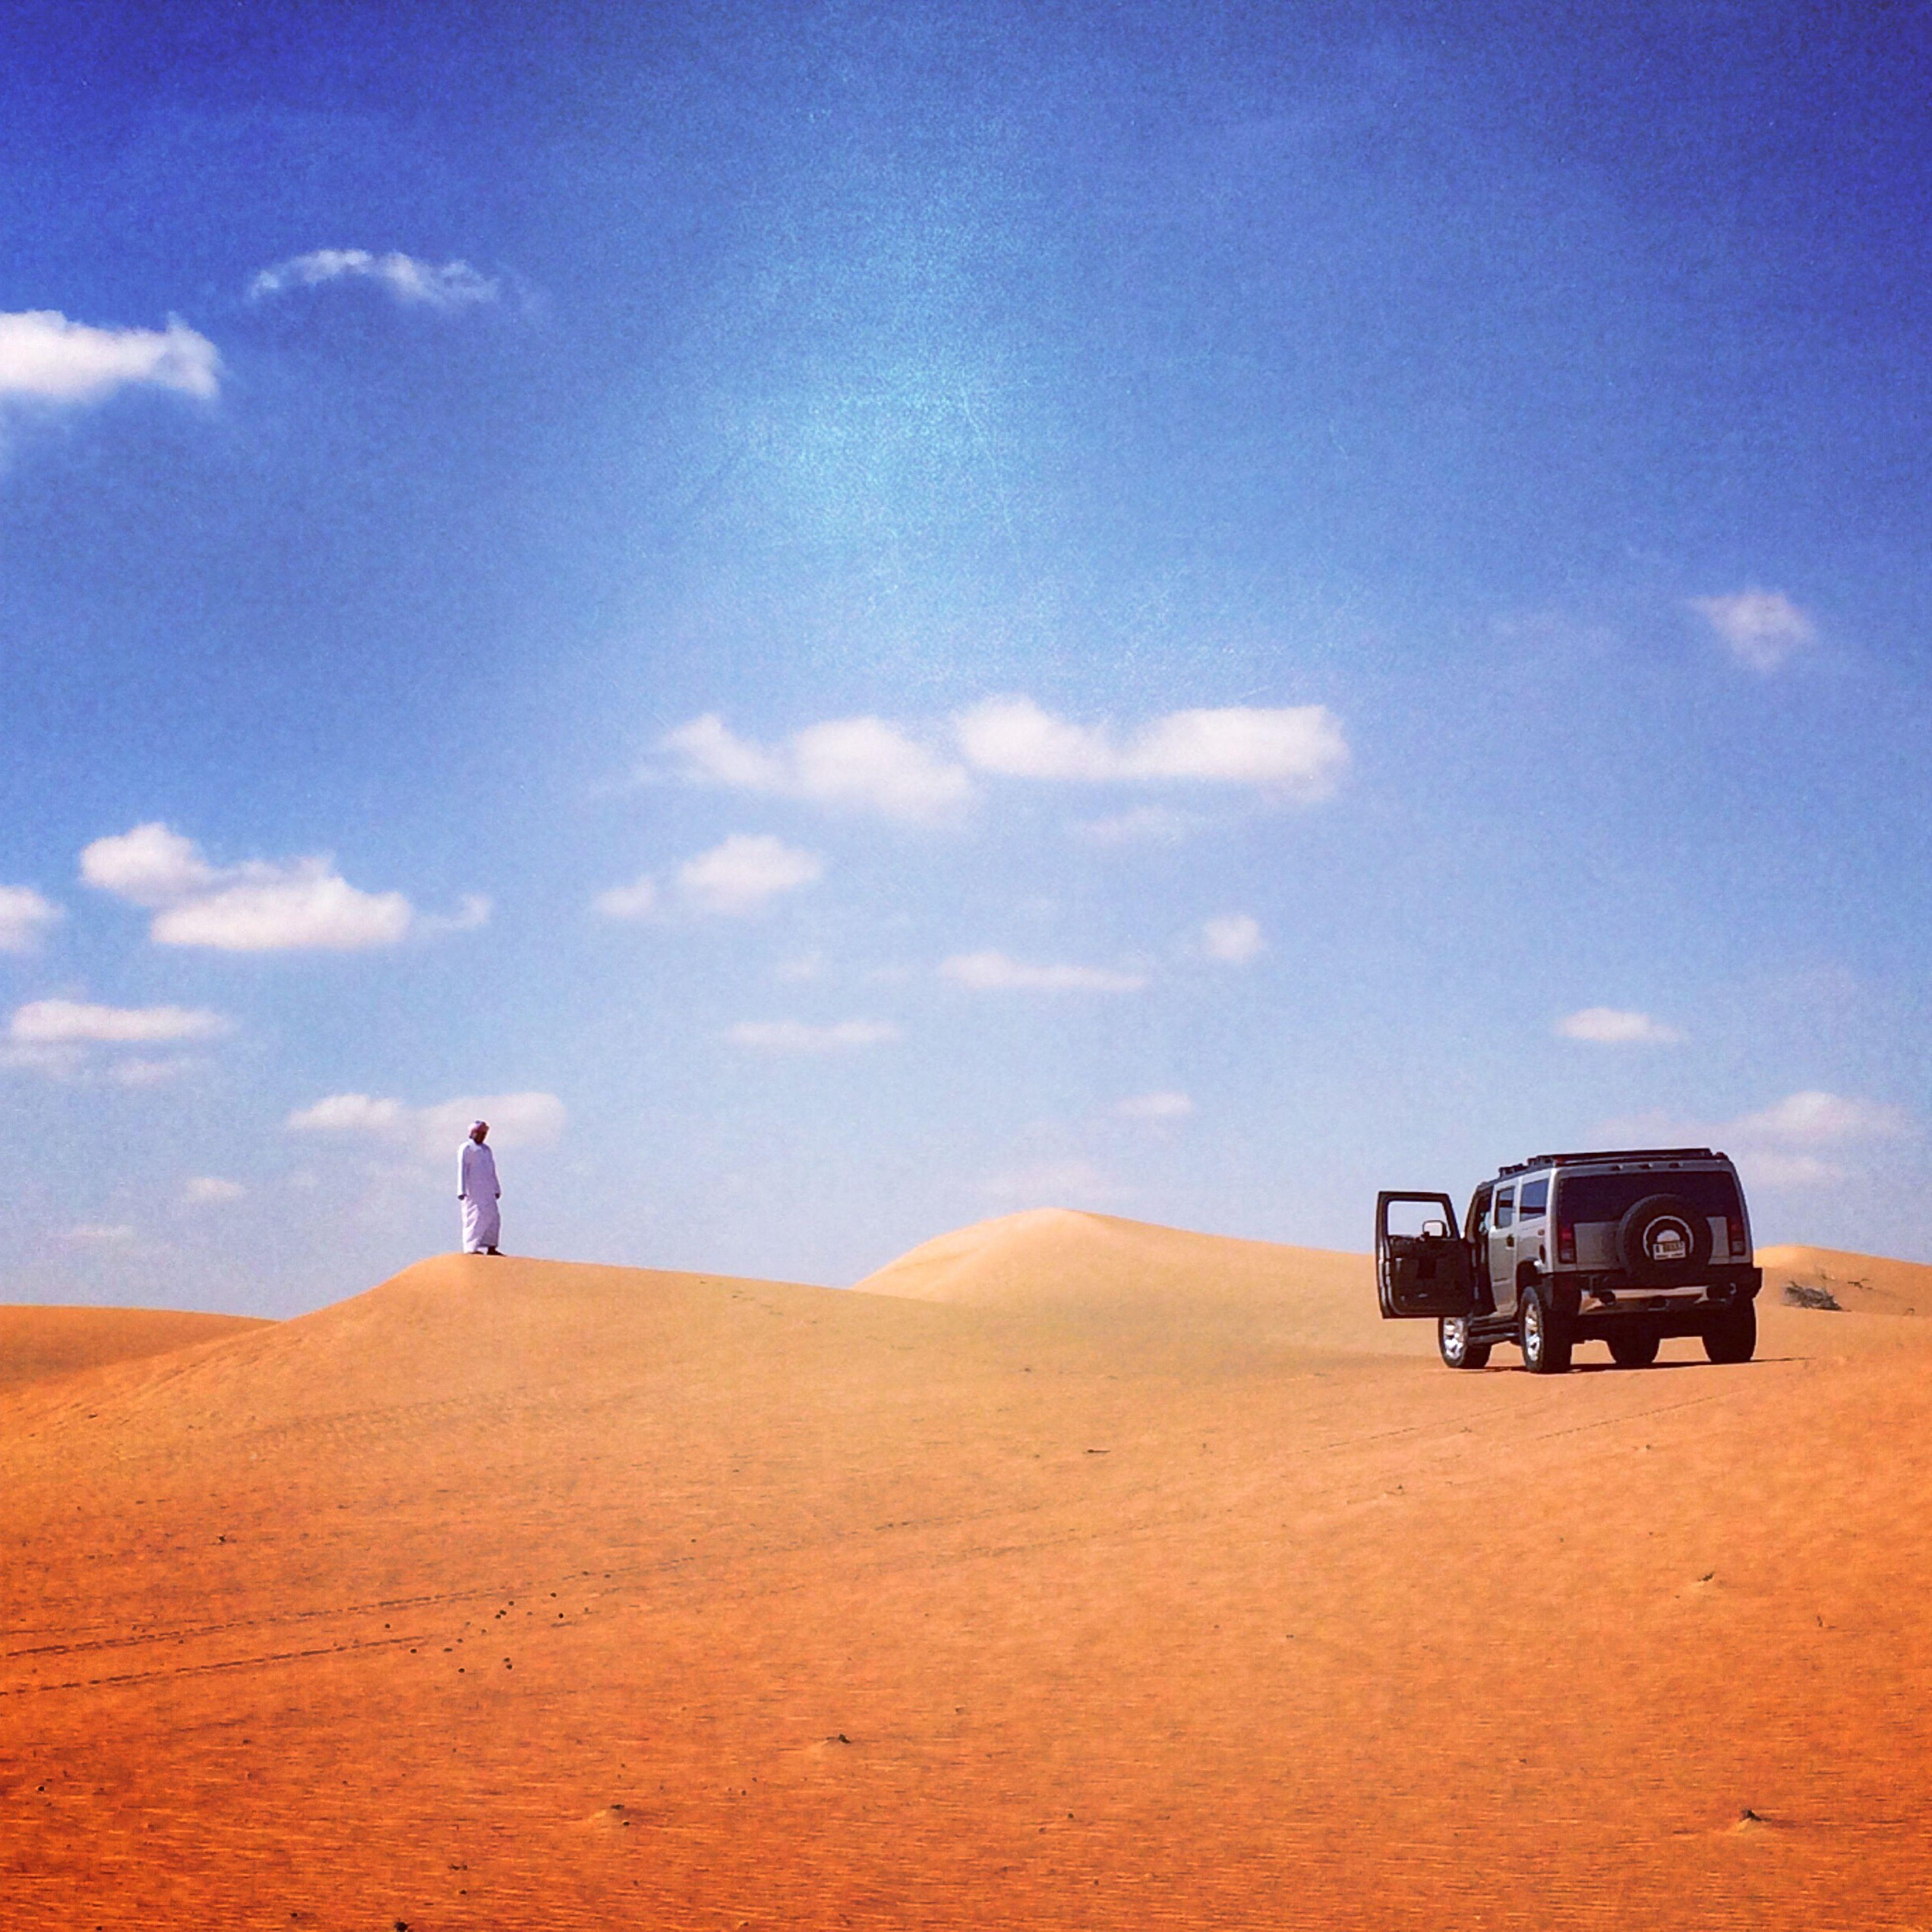 sky, landscape, sand, men, cloud - sky, cloud, mountain, desert, rear view, lifestyles, tranquil scene, leisure activity, nature, transportation, travel, tranquility, land vehicle, scenics